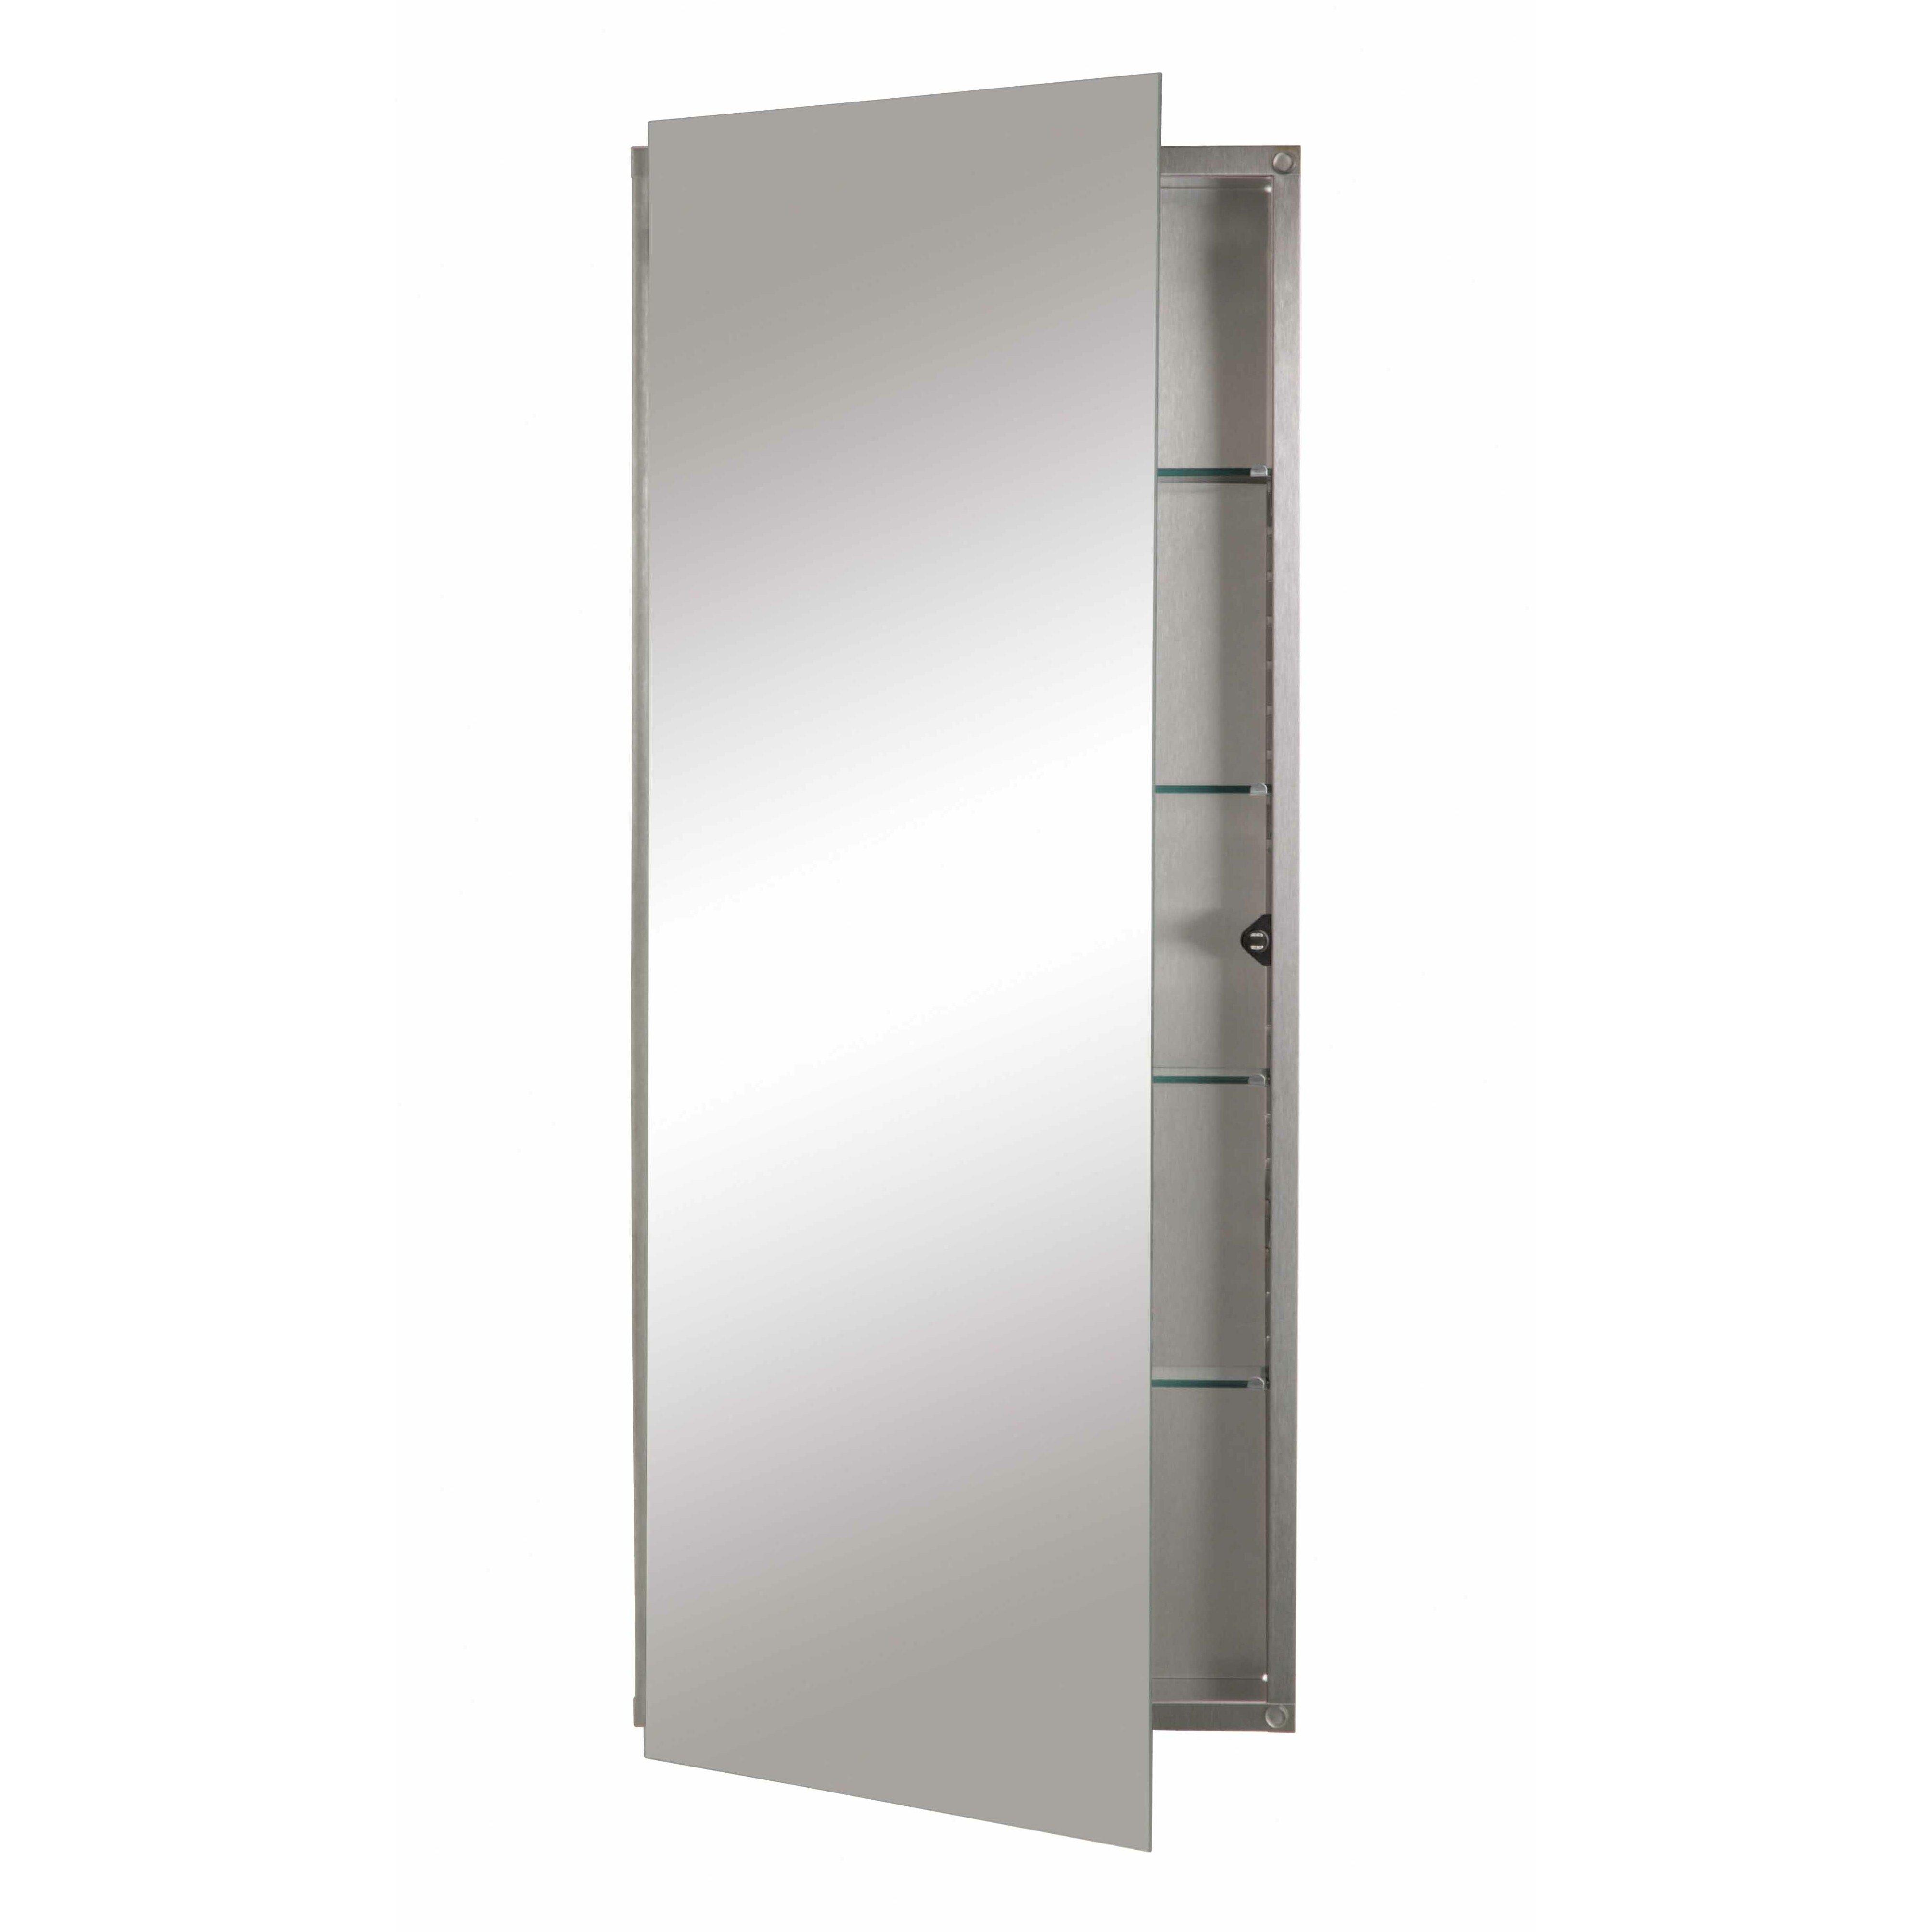 Recessed Bathroom Medicine Cabinets Jensen 15 X 36 Recessed Medicine Cabinet Reviews Wayfair